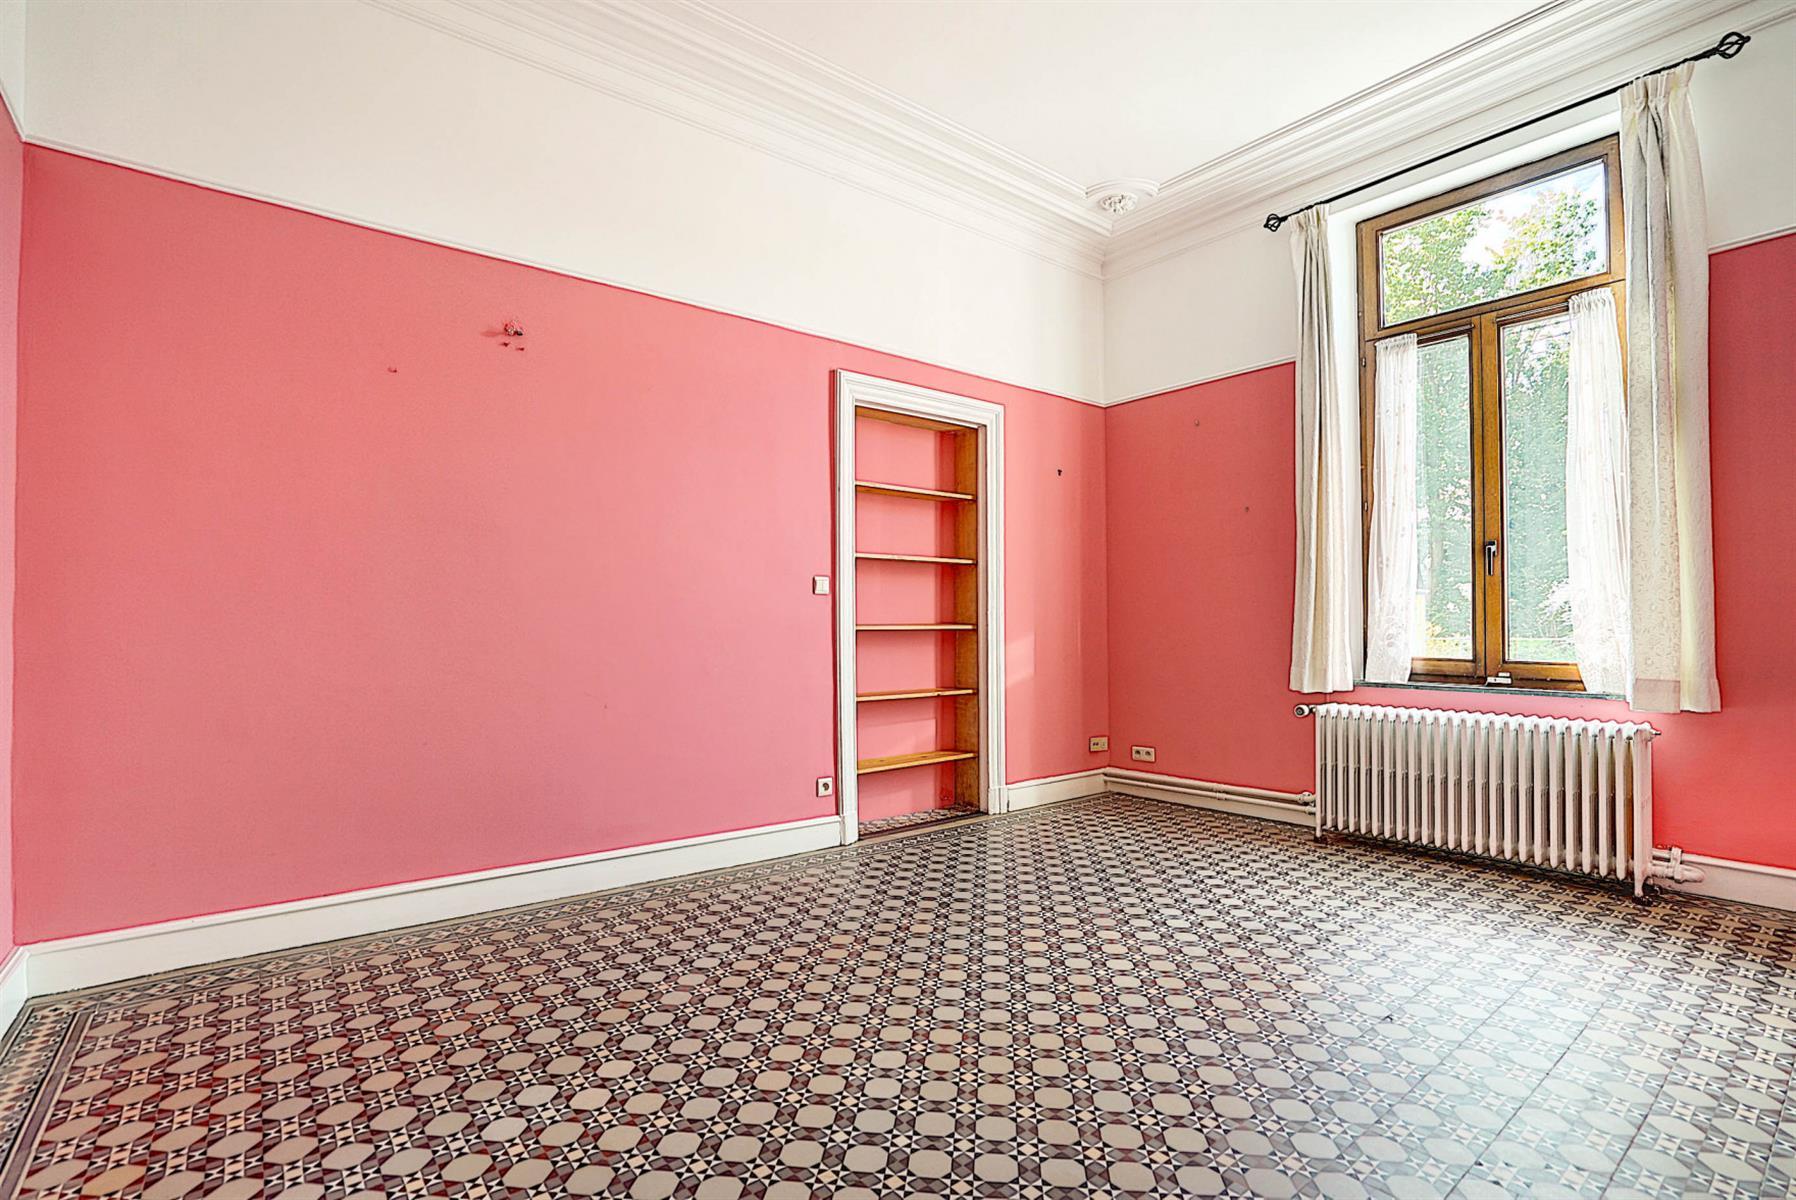 Maison - Bousval - #4131618-8